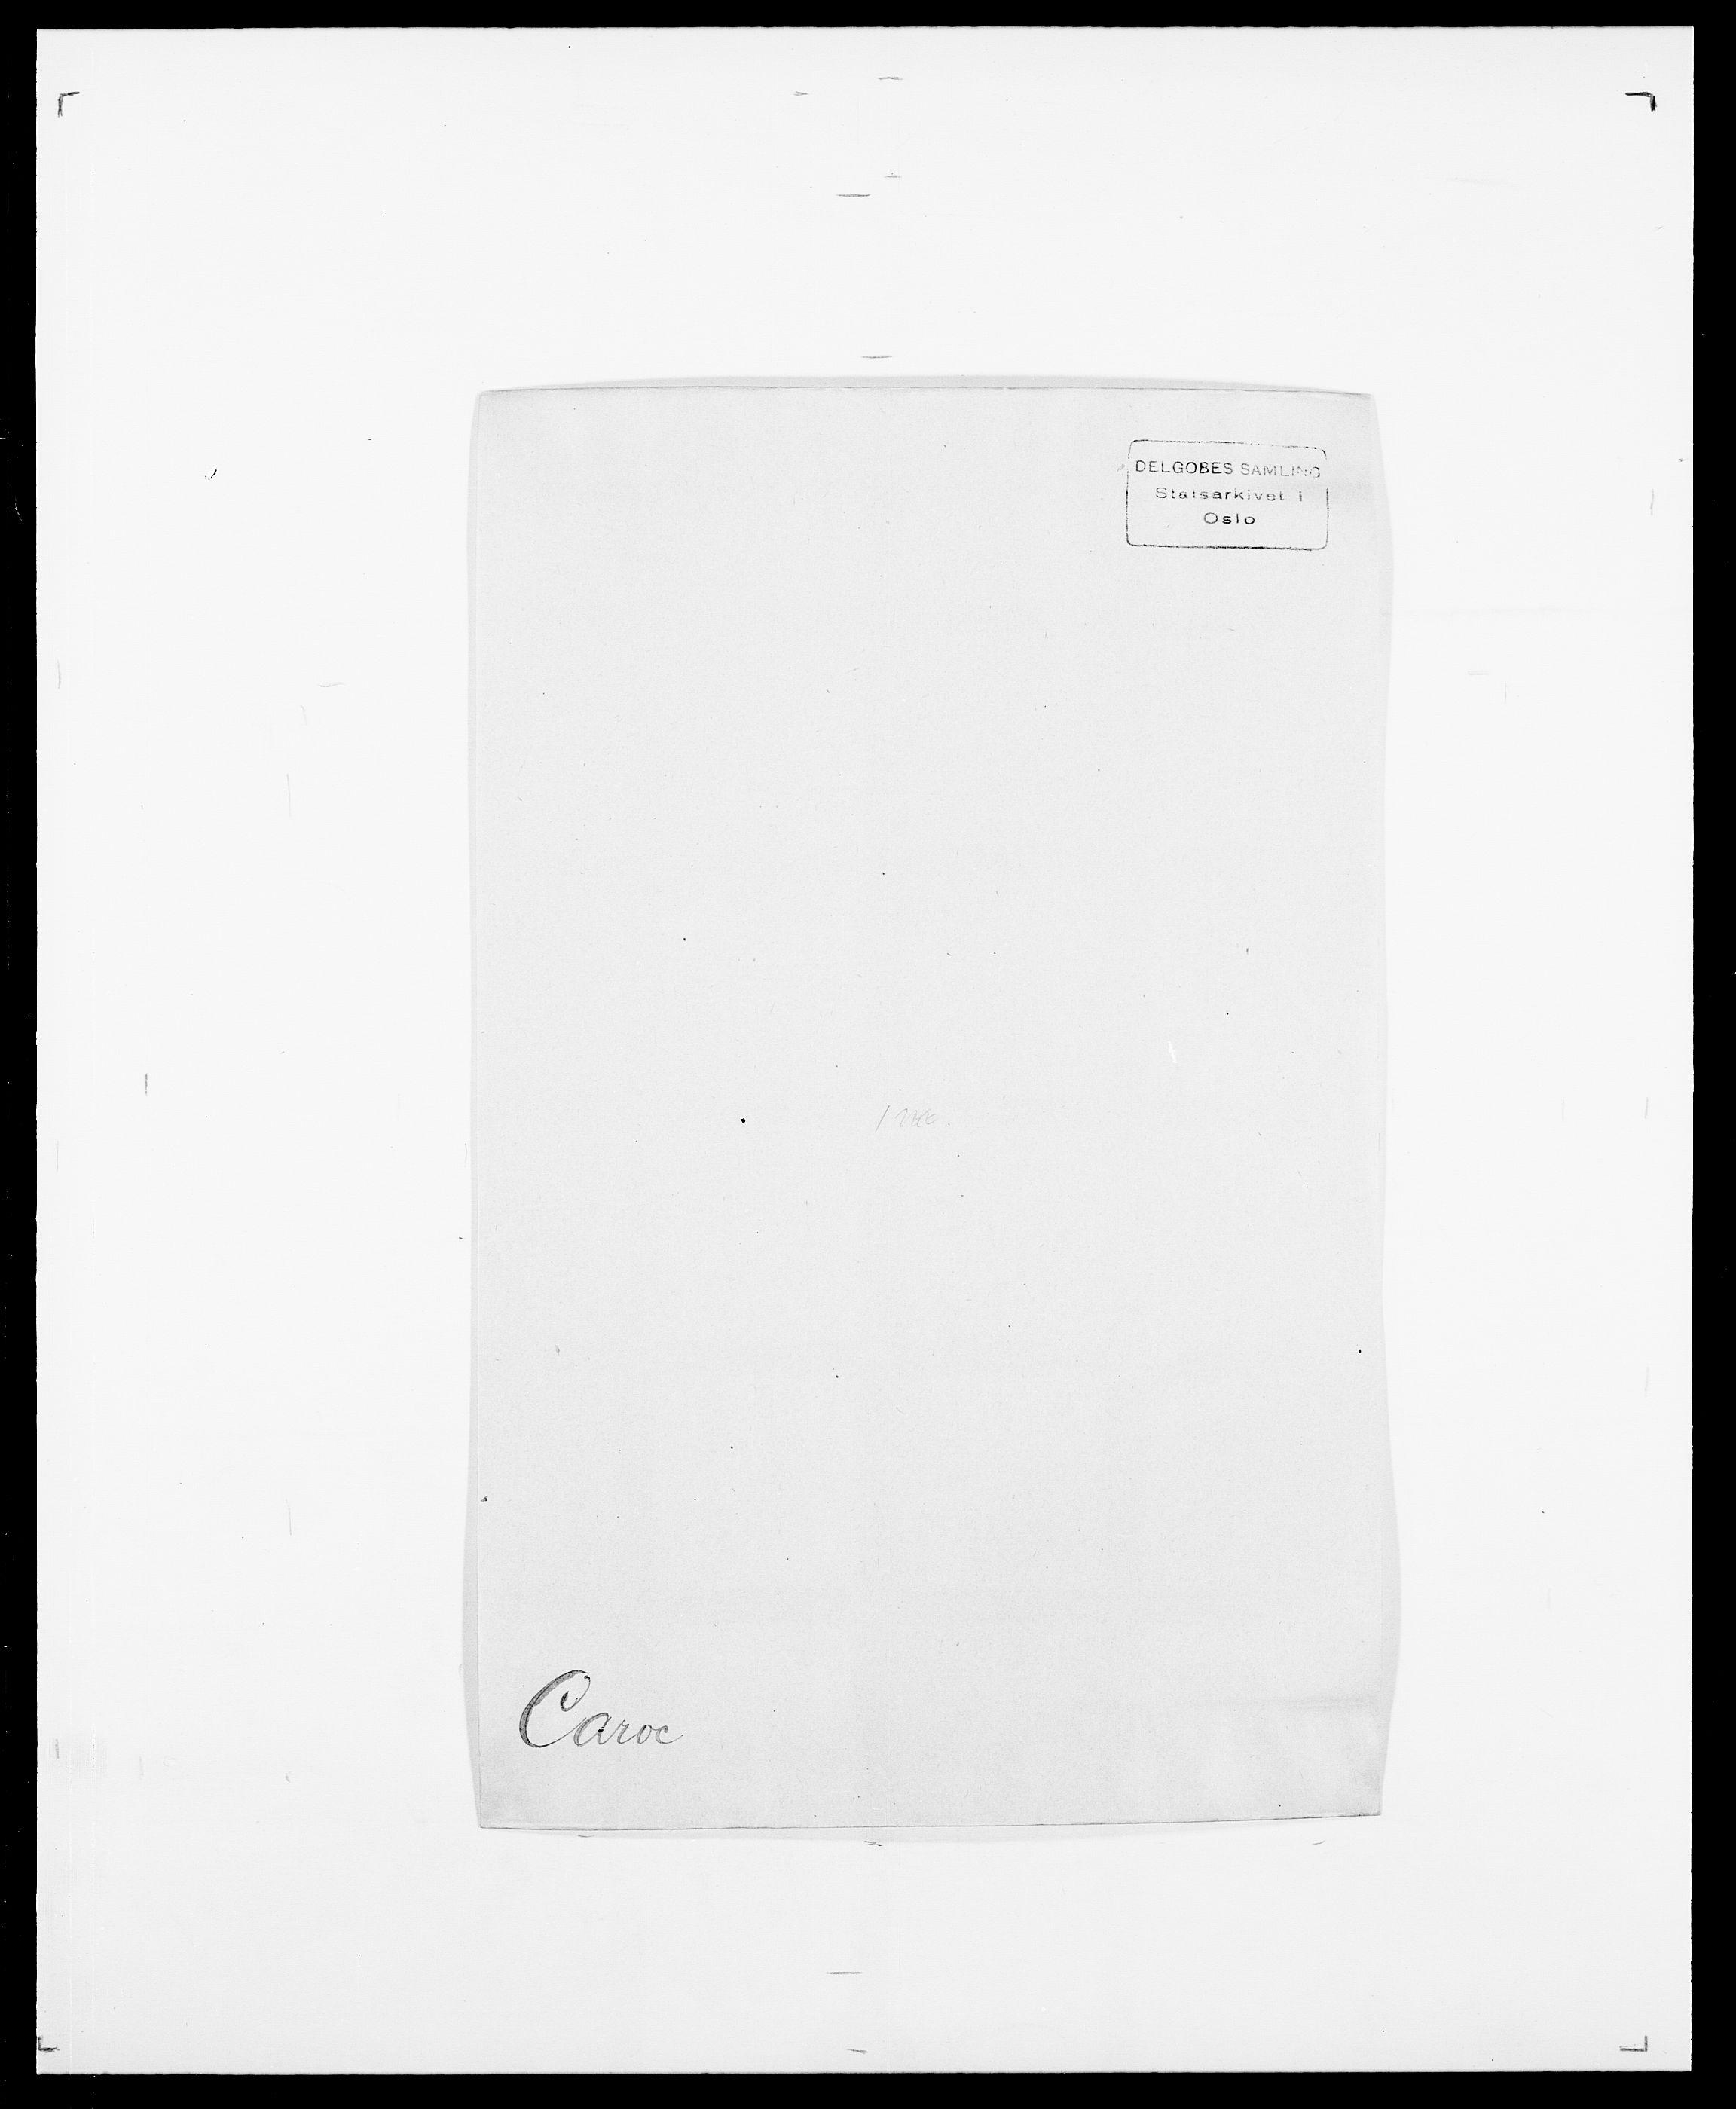 SAO, Delgobe, Charles Antoine - samling, D/Da/L0008: Capjon - Dagenbolt, s. 79